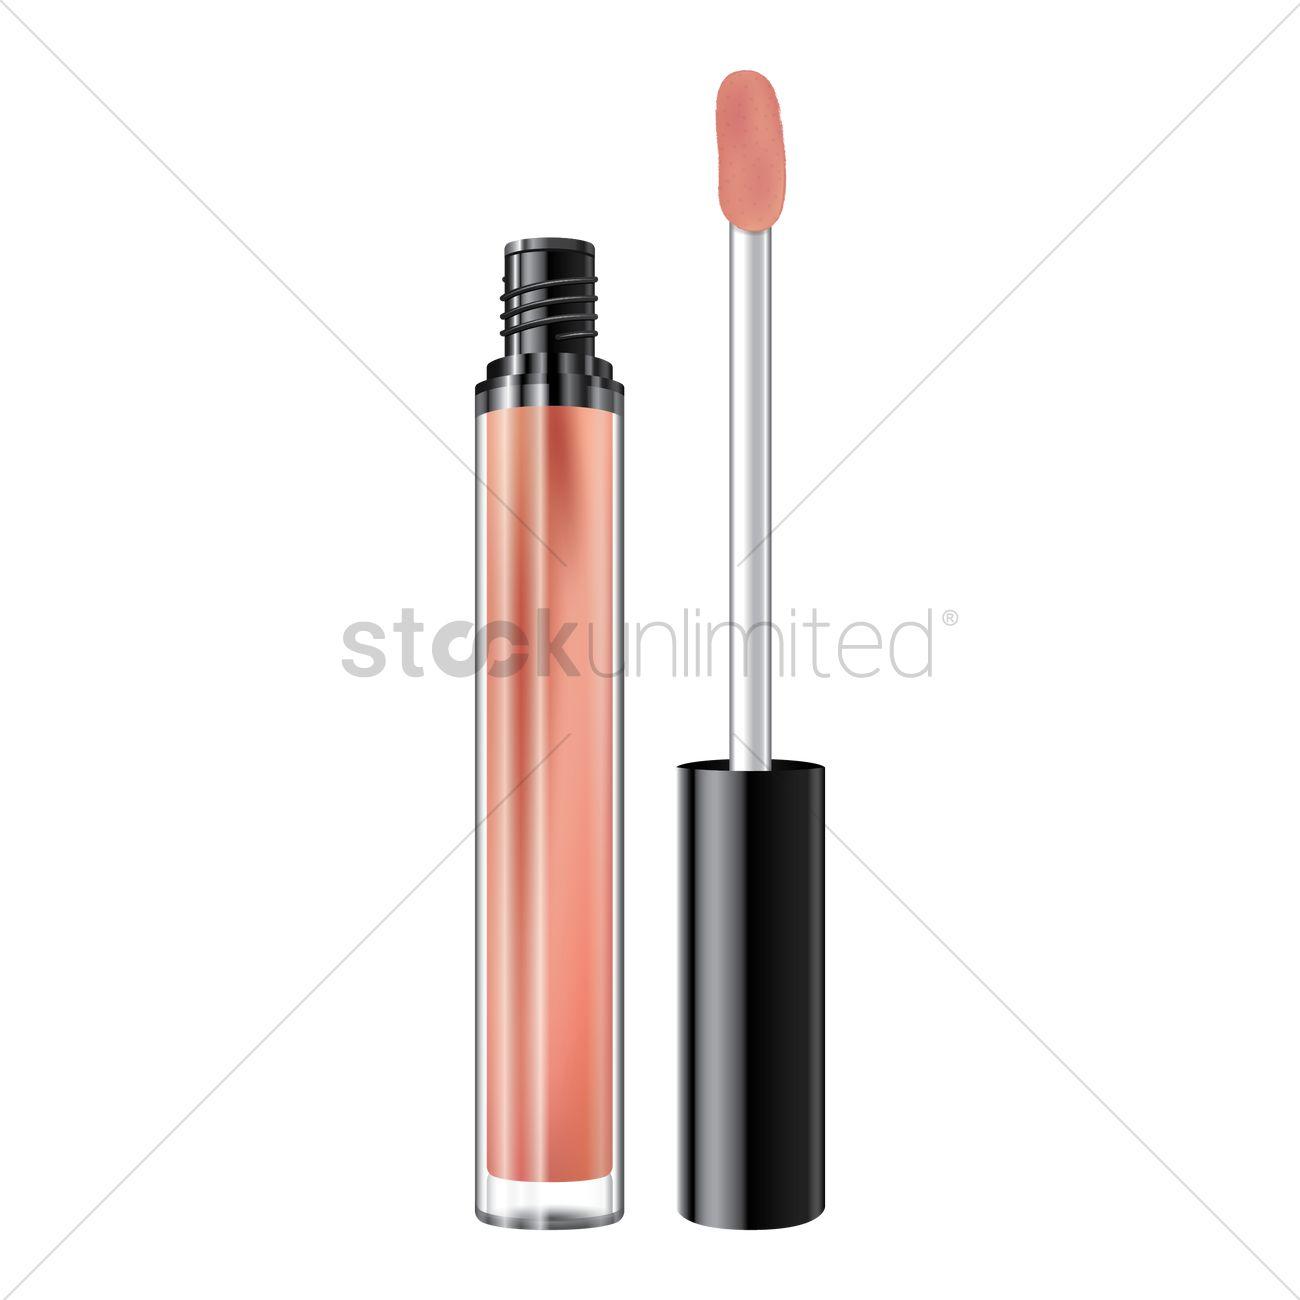 Lip gloss Vector Image.